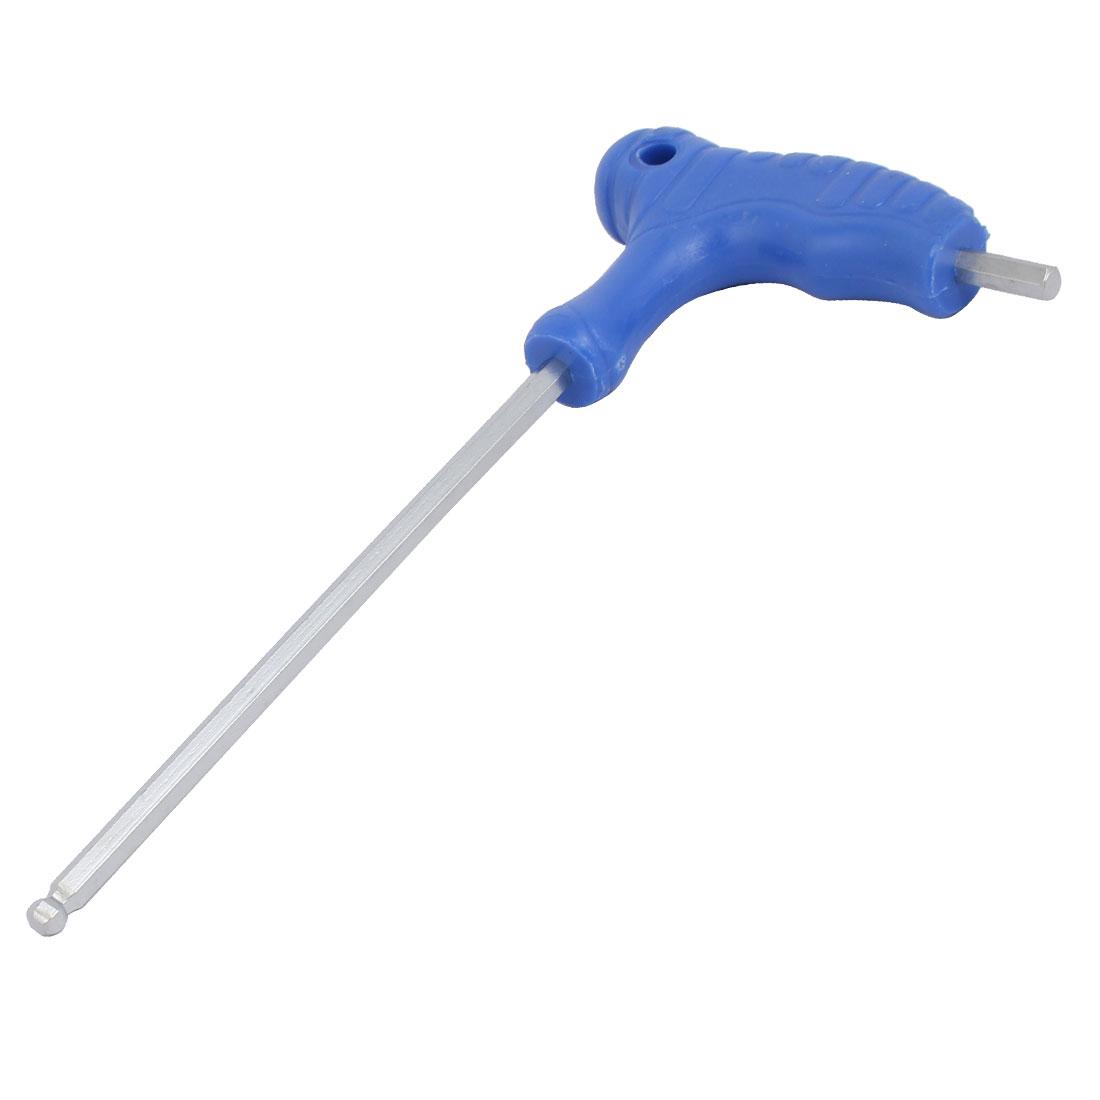 H4 4mm Tip Shaft T Handle Ball Head Hex Hexagon Key Wrench Tool Blue